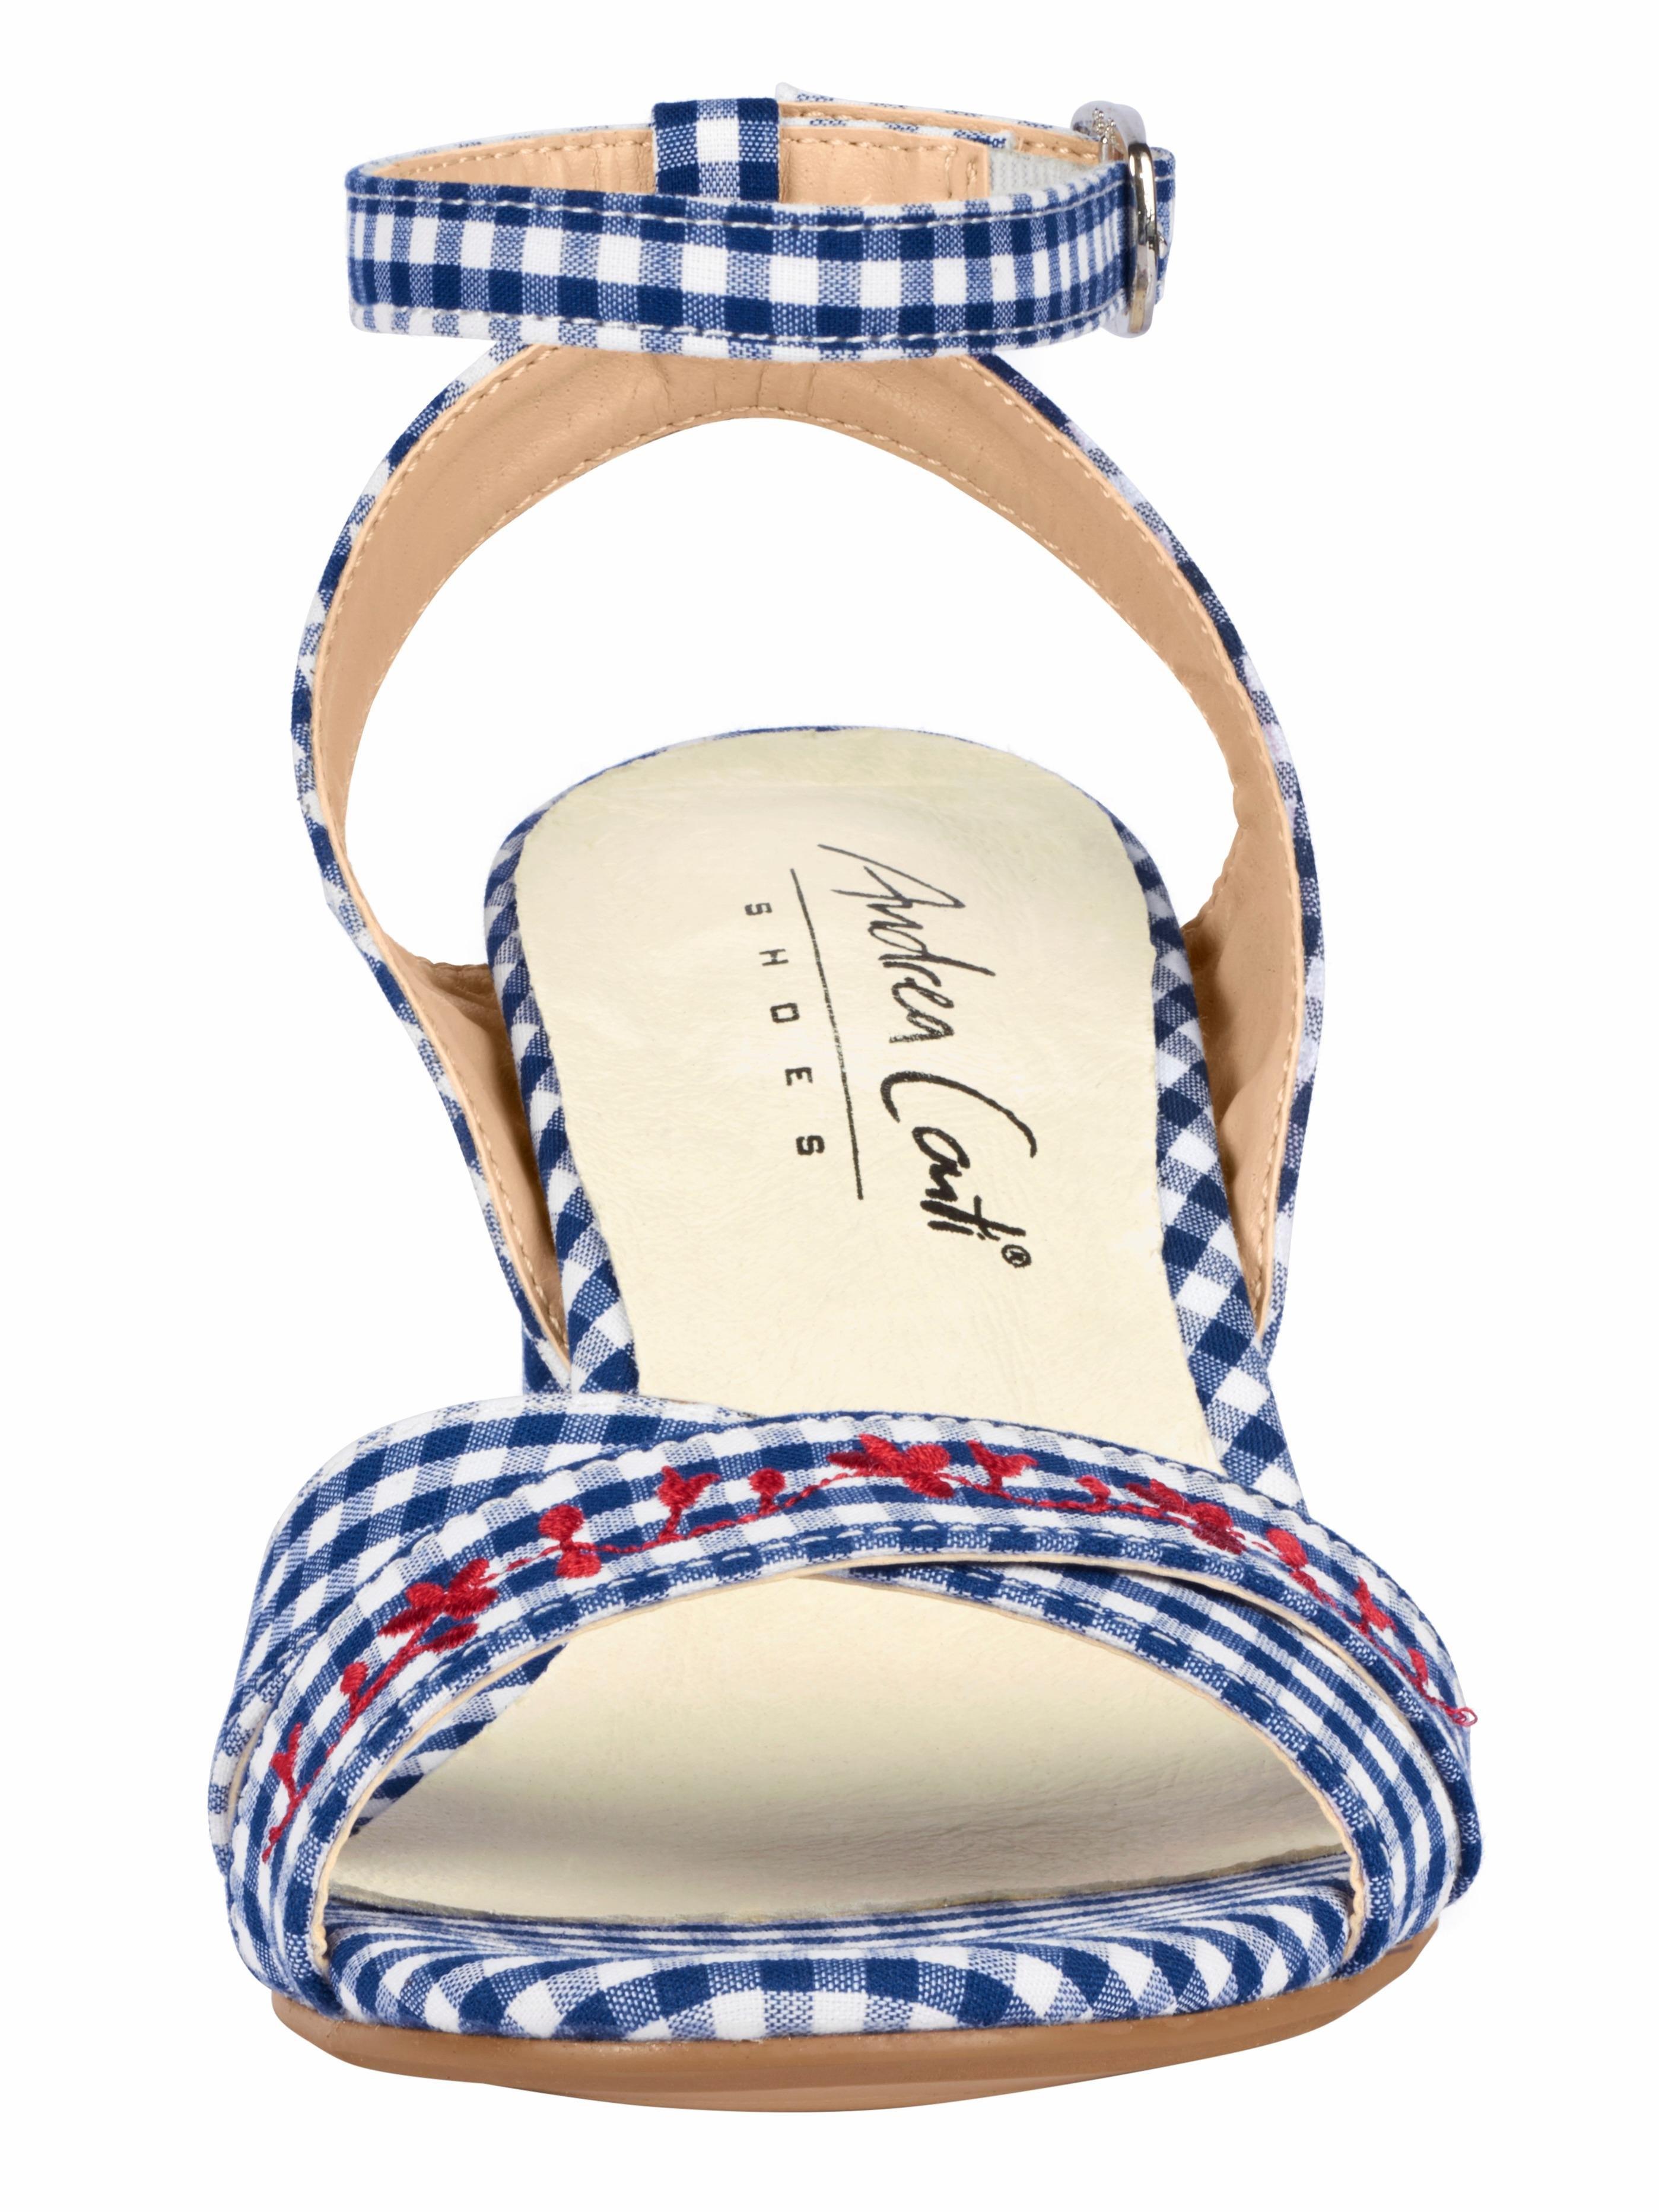 Kopen Sandaaltjes Online Sandaaltjes Nu Kopen Nu Nu Sandaaltjes Online zLSMpqUVG